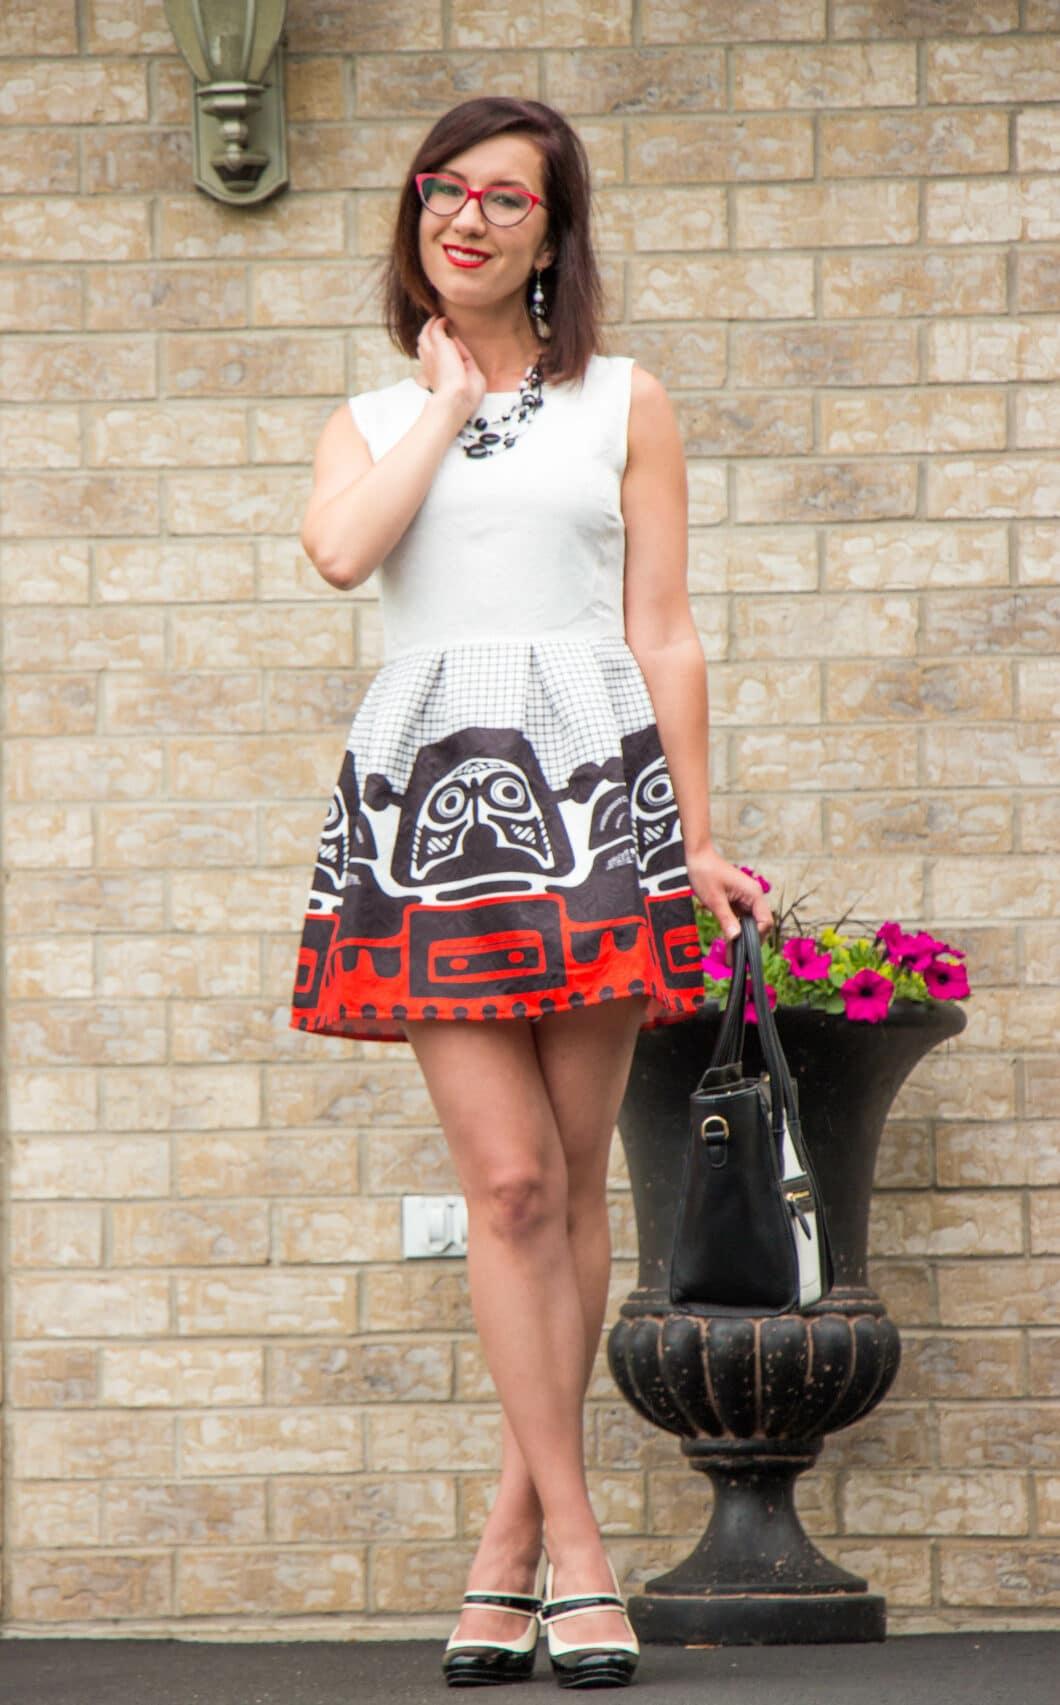 Shein Skater dress